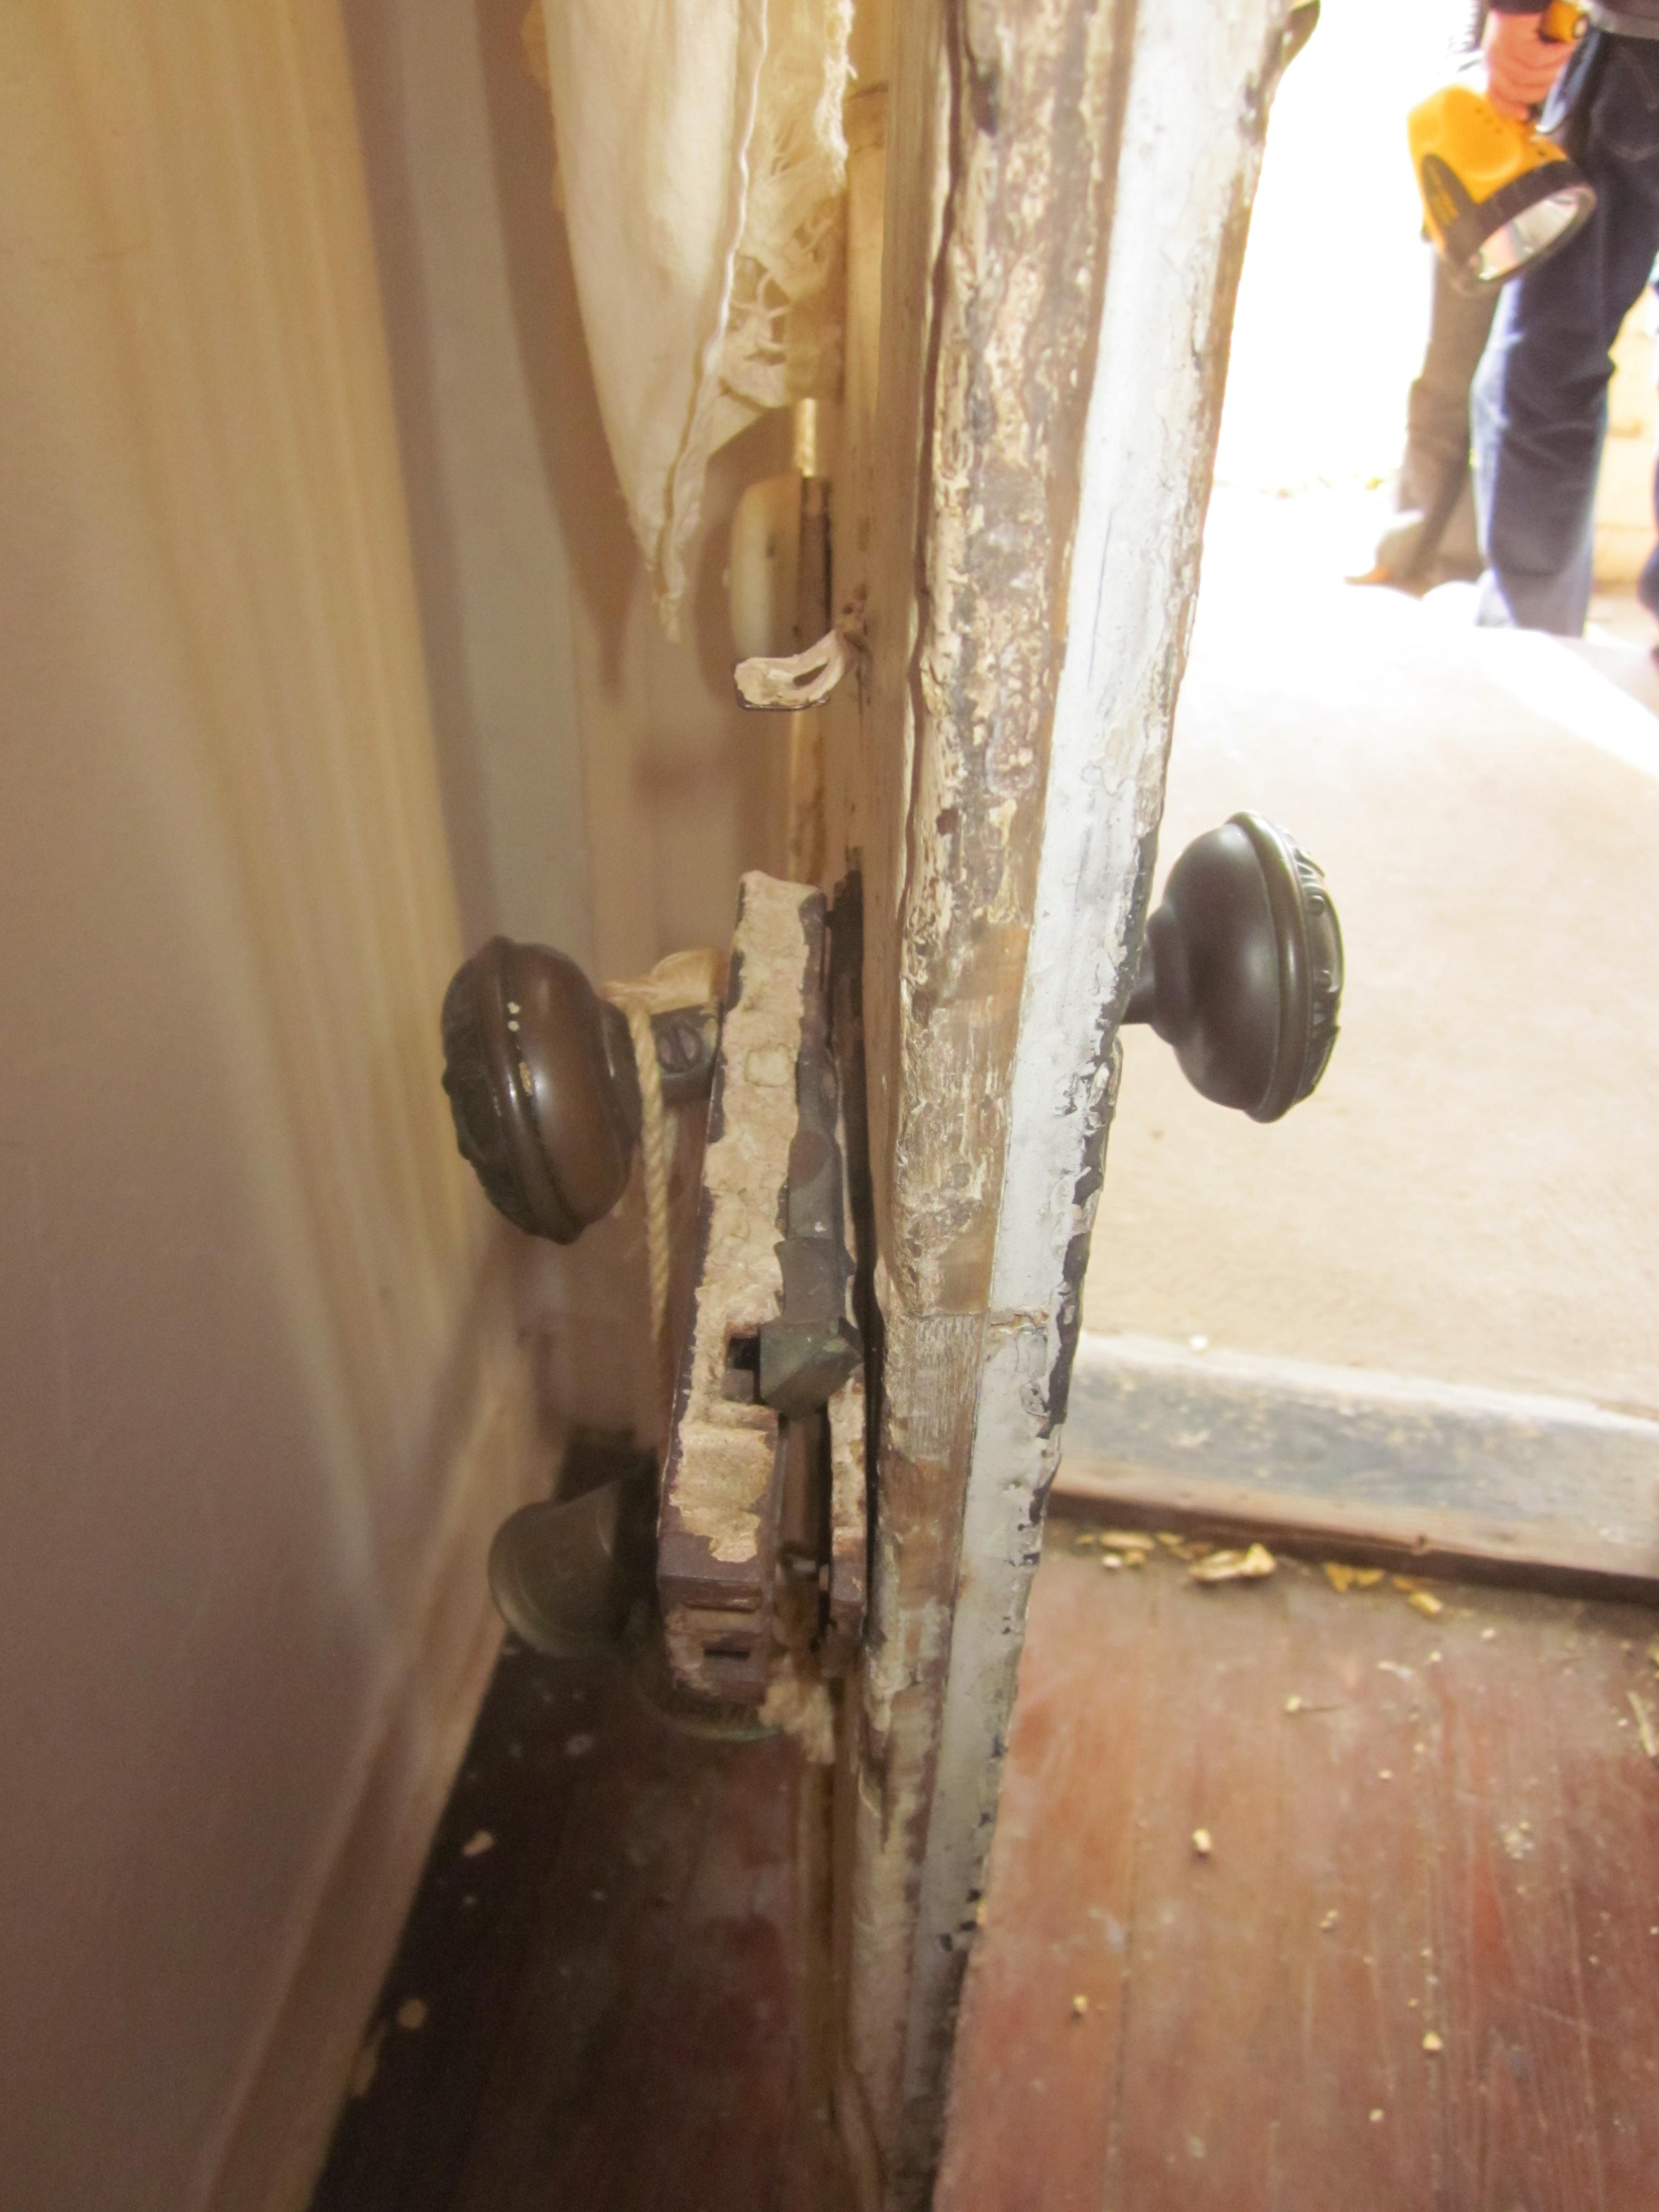 interior installation made door custom barn by track flat knob hand installatio hardware basincustom